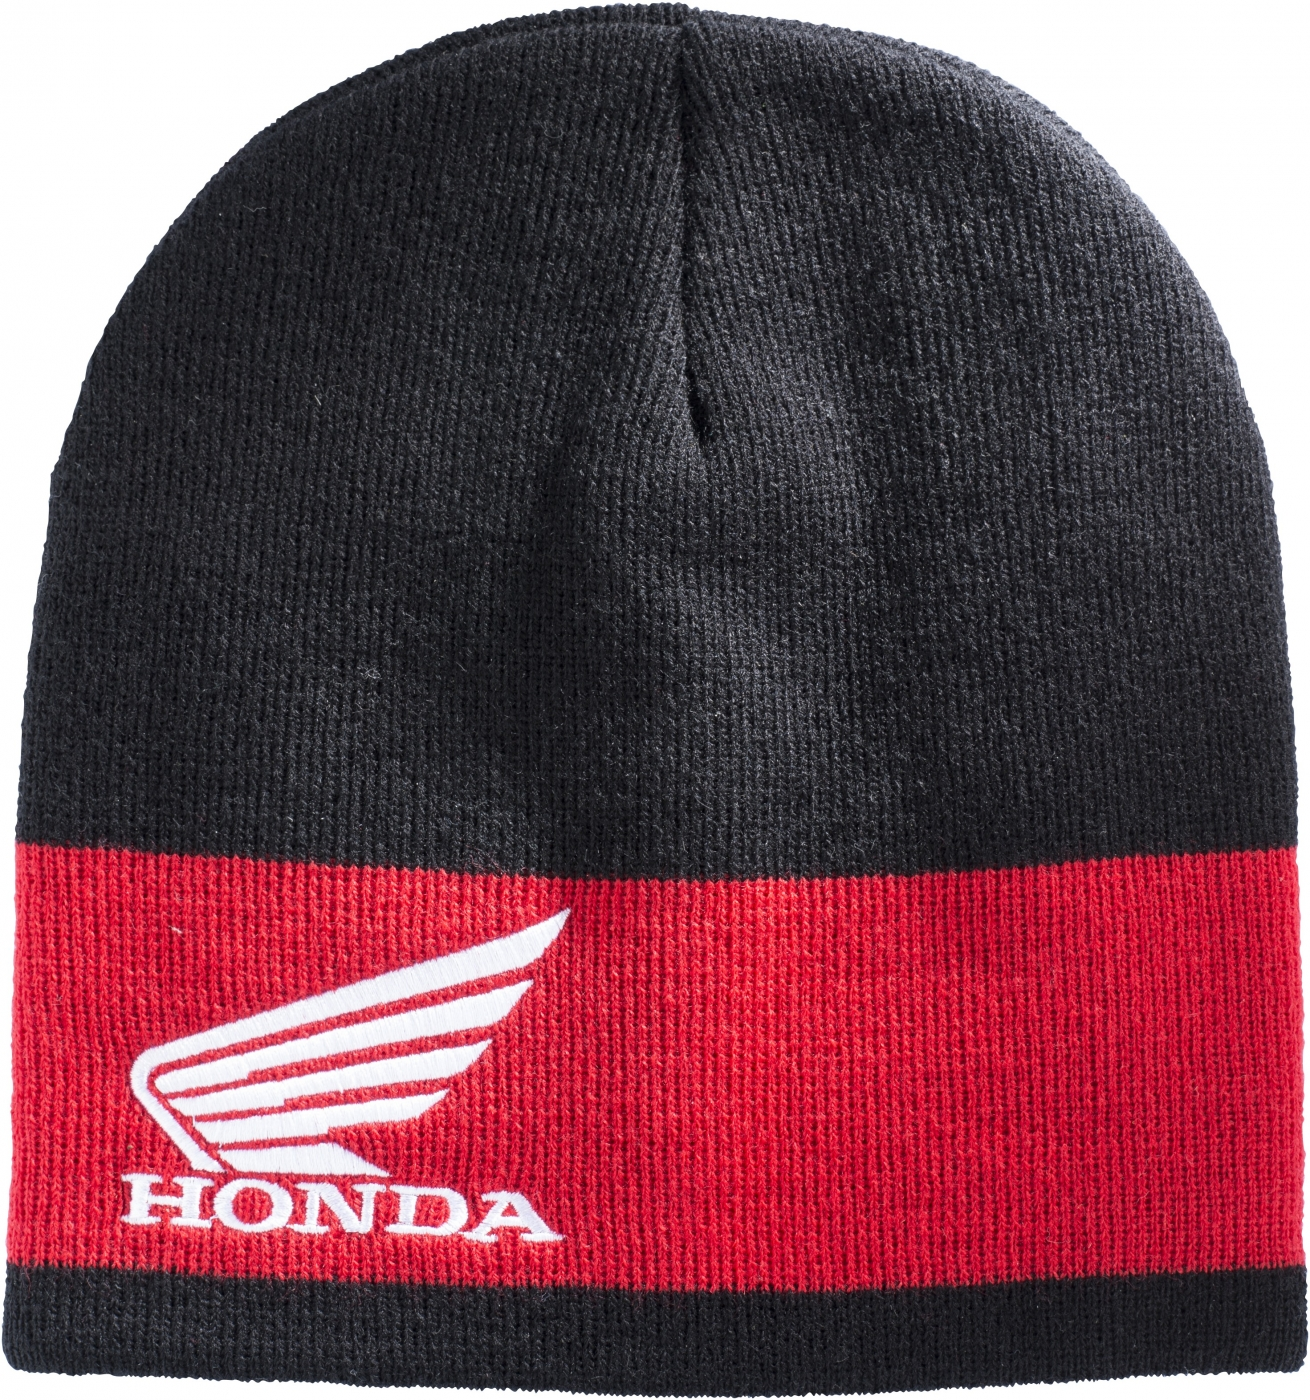 HONDA čepice RACING 18 black red  cdc533de24